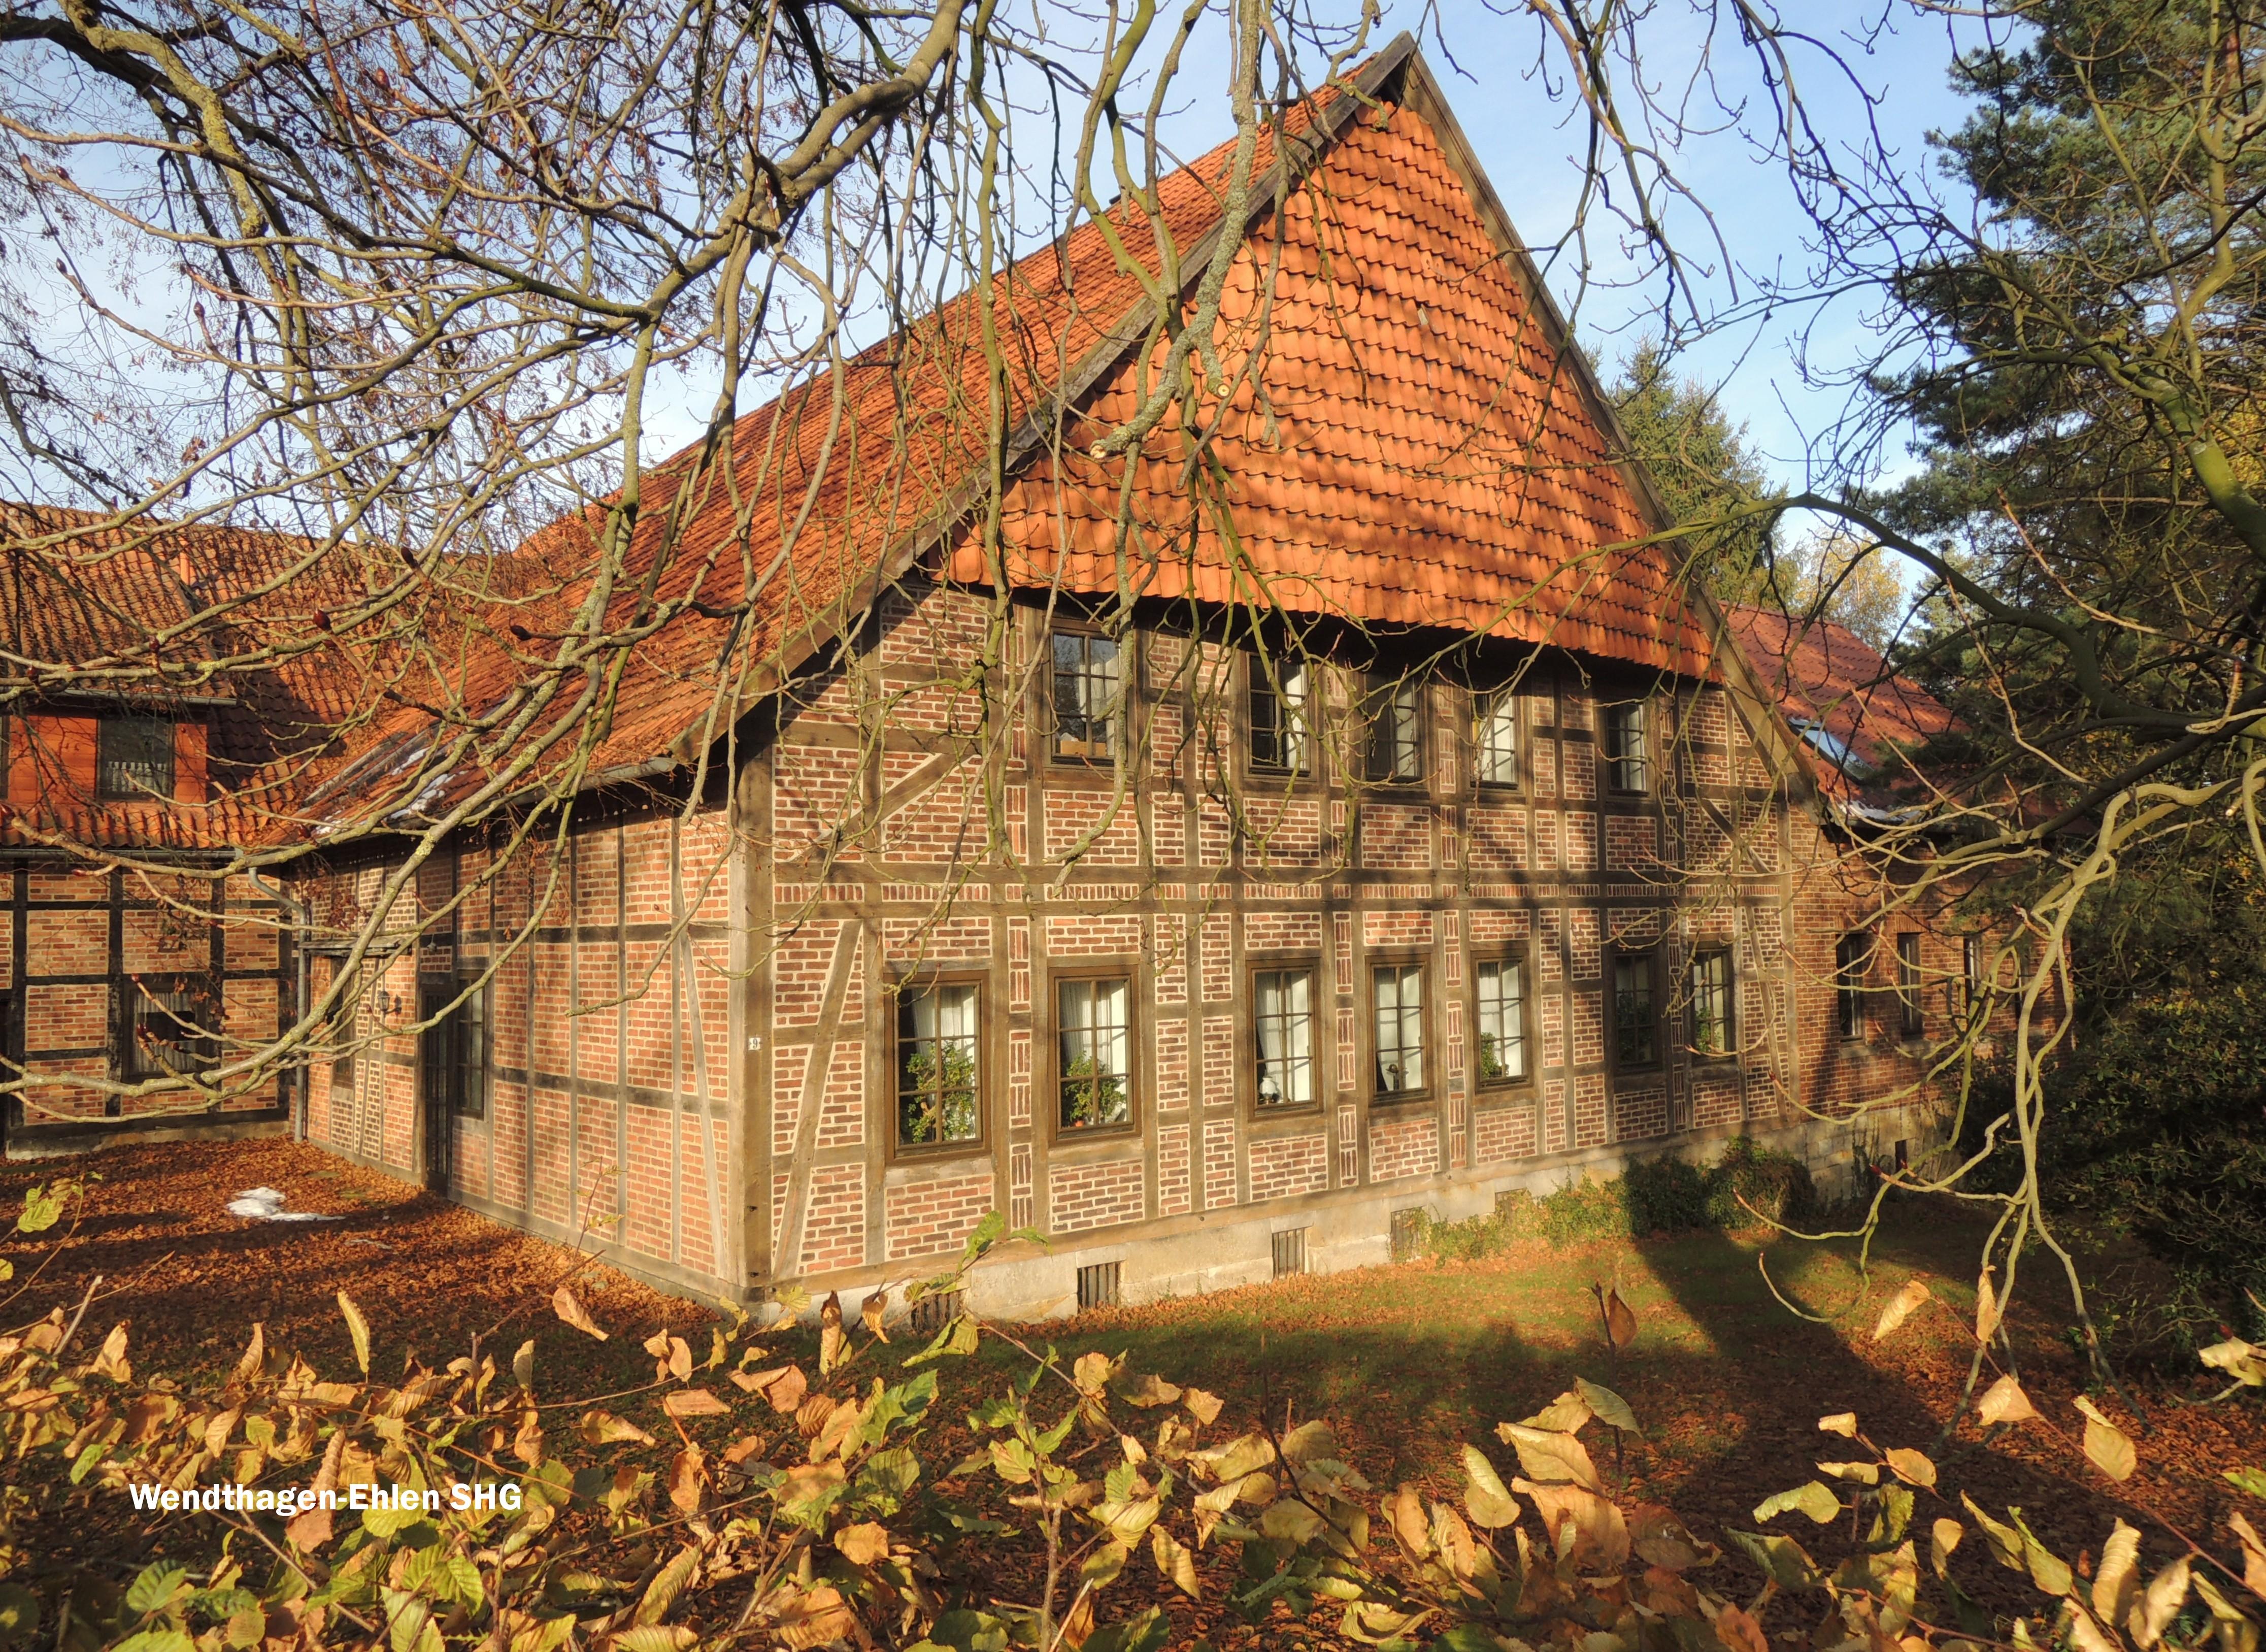 r-wendthagen-ehlen-shg,